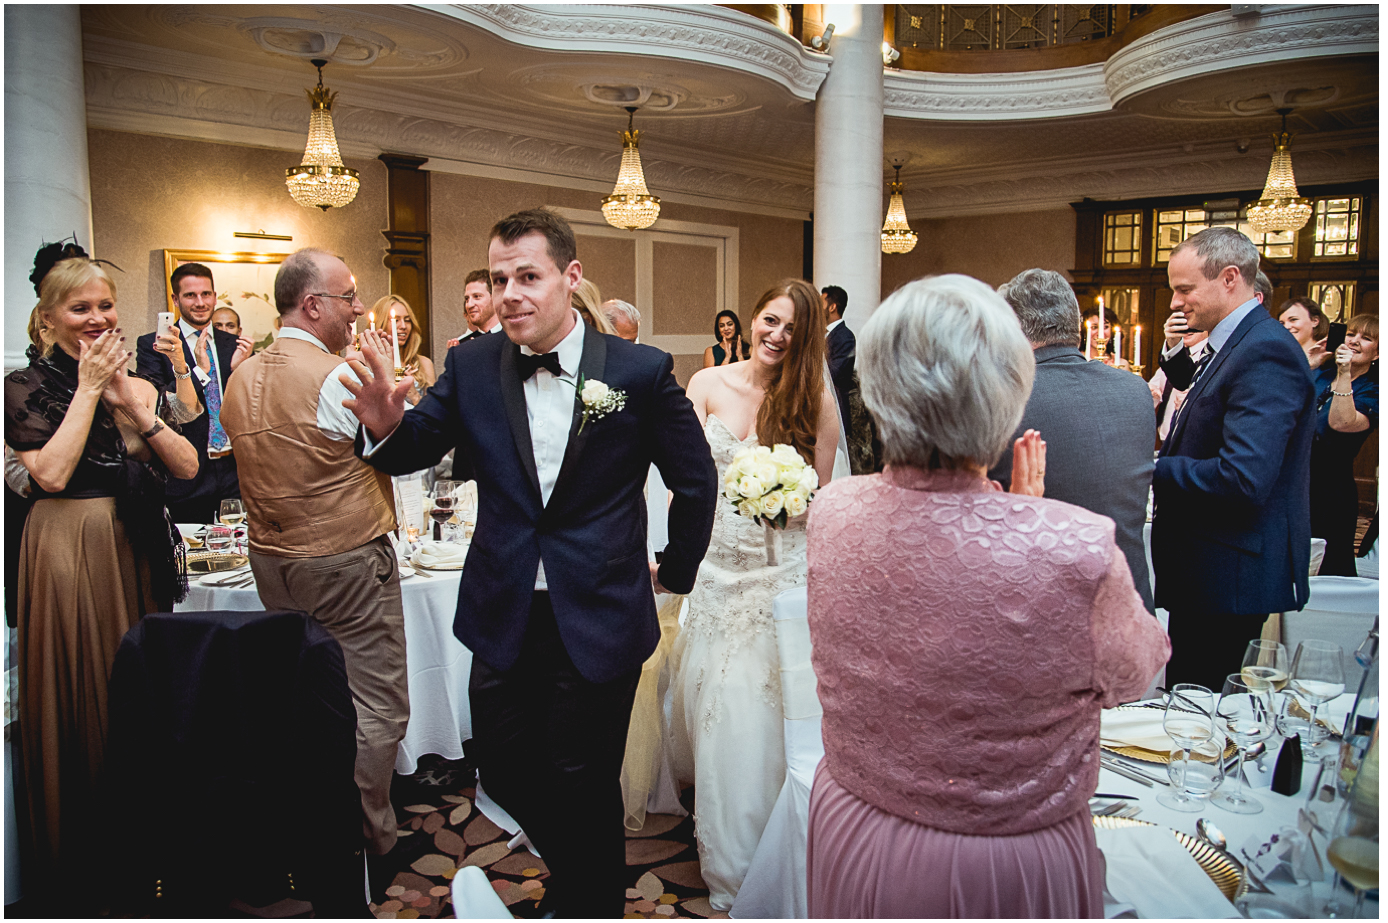 59 - Esmat and Angus - St. Ermin's Hotel London wedding photographer